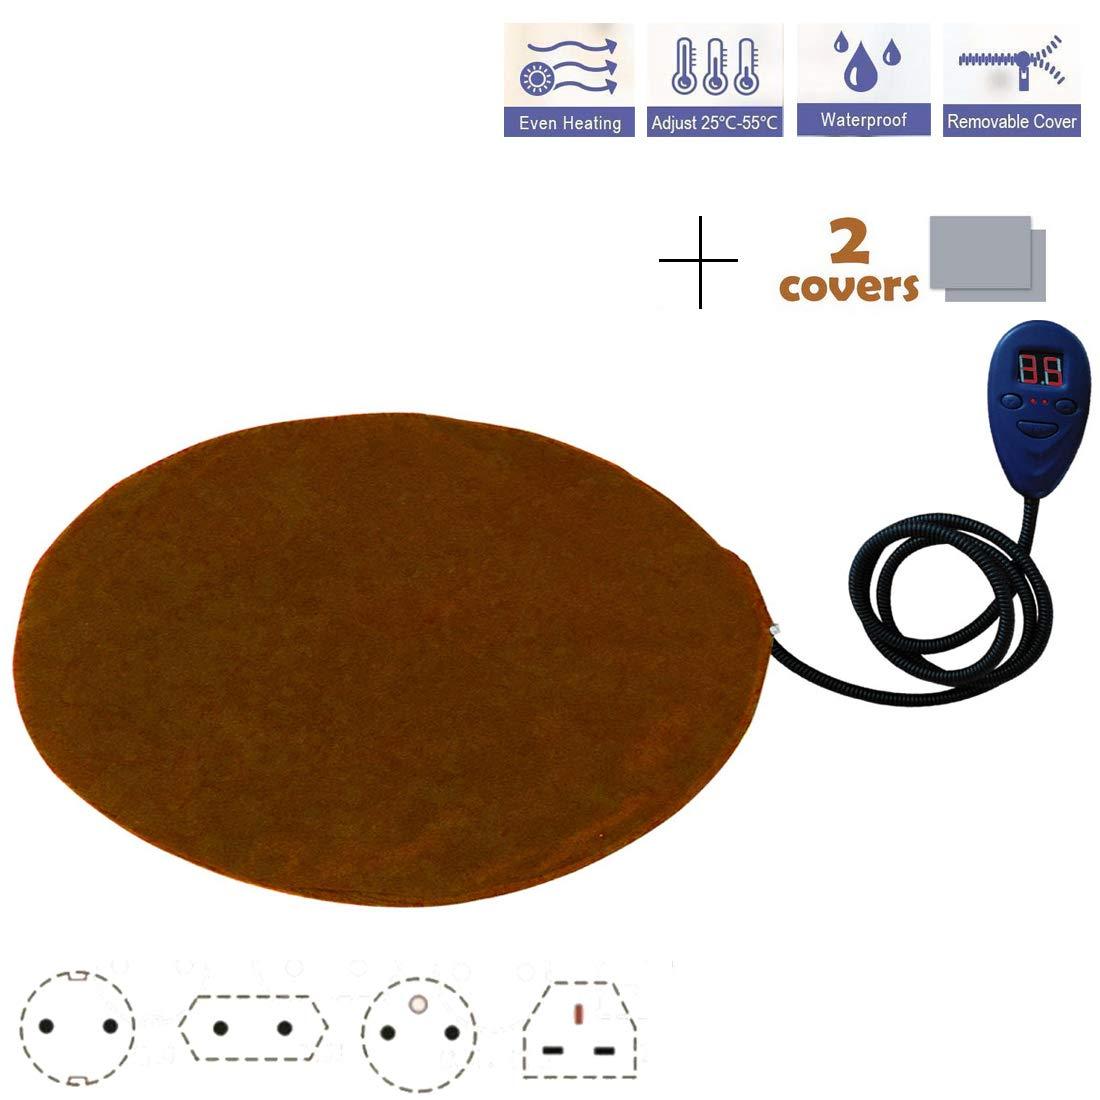 Brown Europeanplug2pcs Brown Europeanplug2pcs HABITREE Pet Heating Pad Cat Dog Electric Self Heating Mat Waterproof Adjustable Chew Resistant Steel Cord 30X30CM 12V, Brown,Europeanplug2pcs